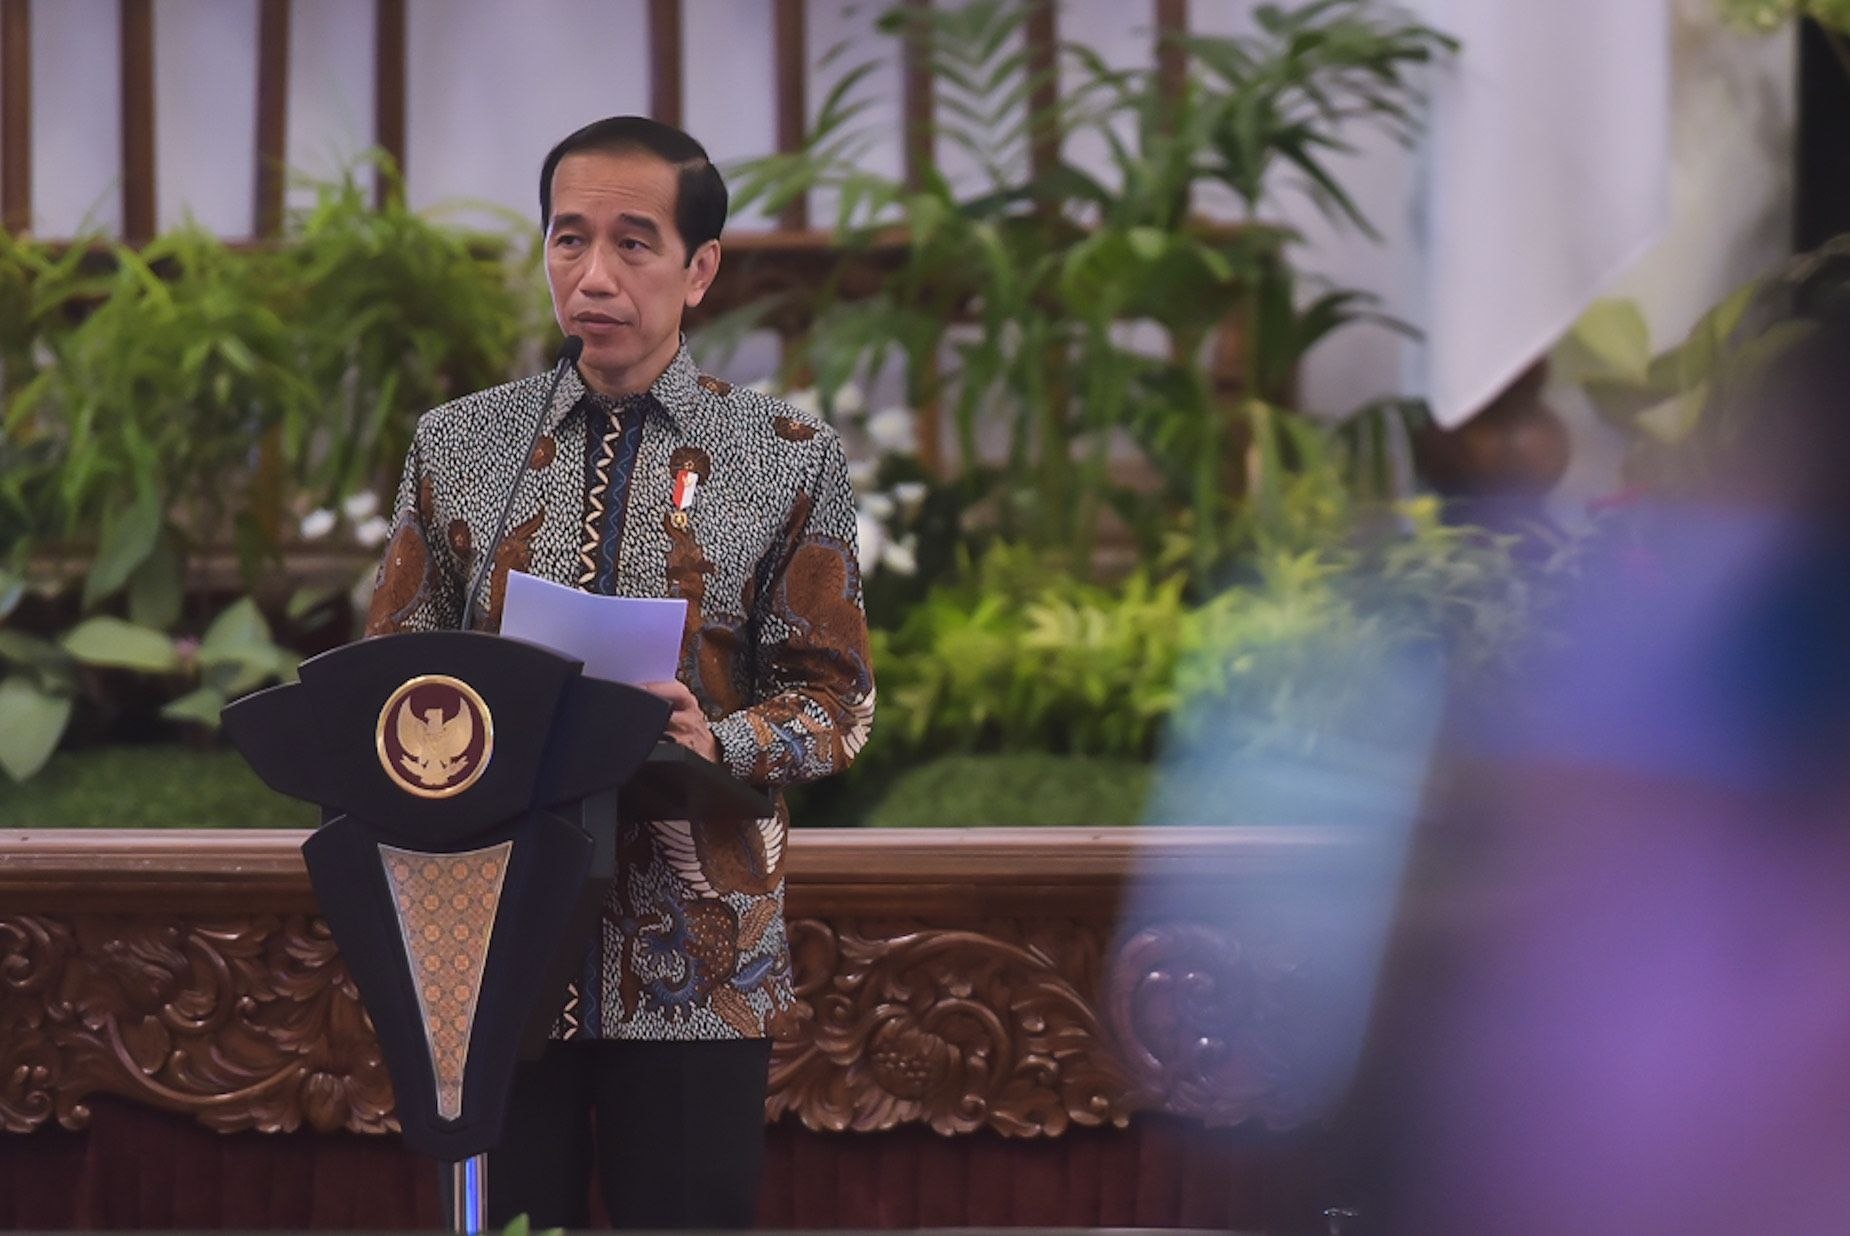 Atasi Krisis, Presiden Jokowi Tekankan Buang Ego Sektoral